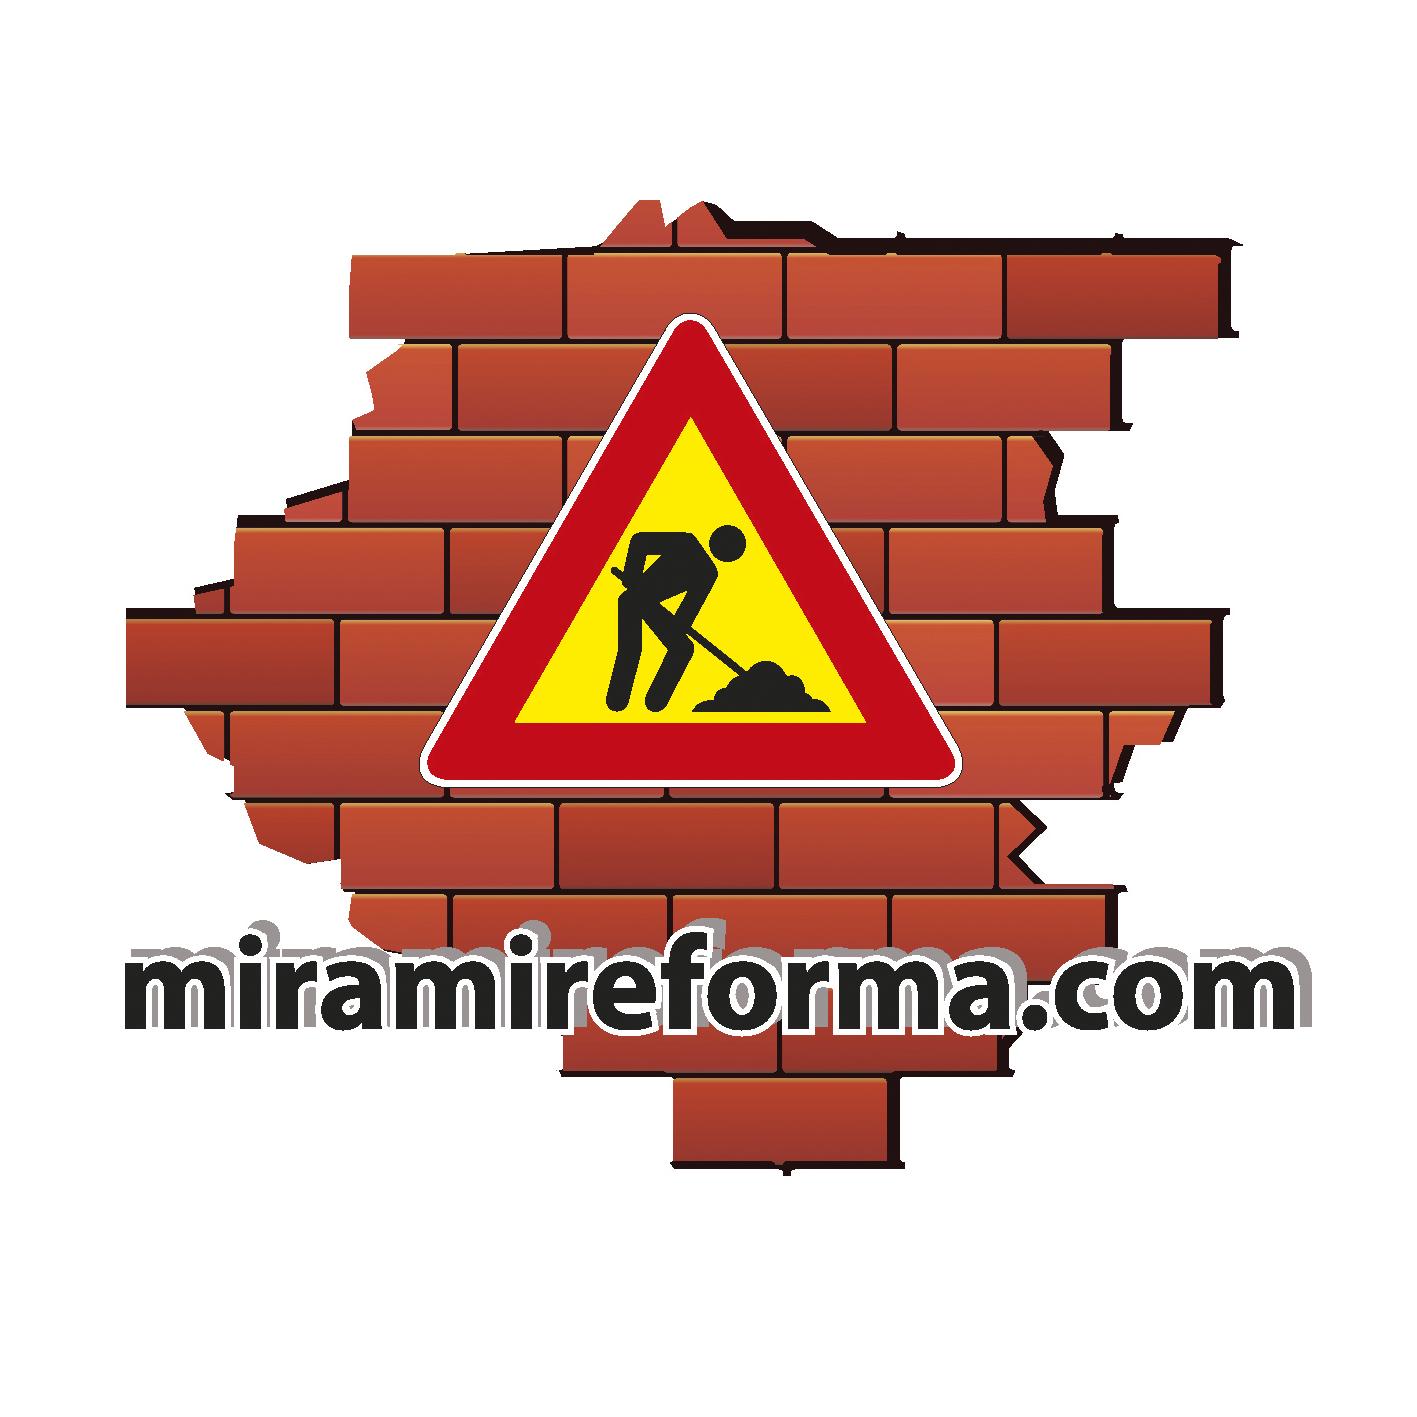 miramireforma